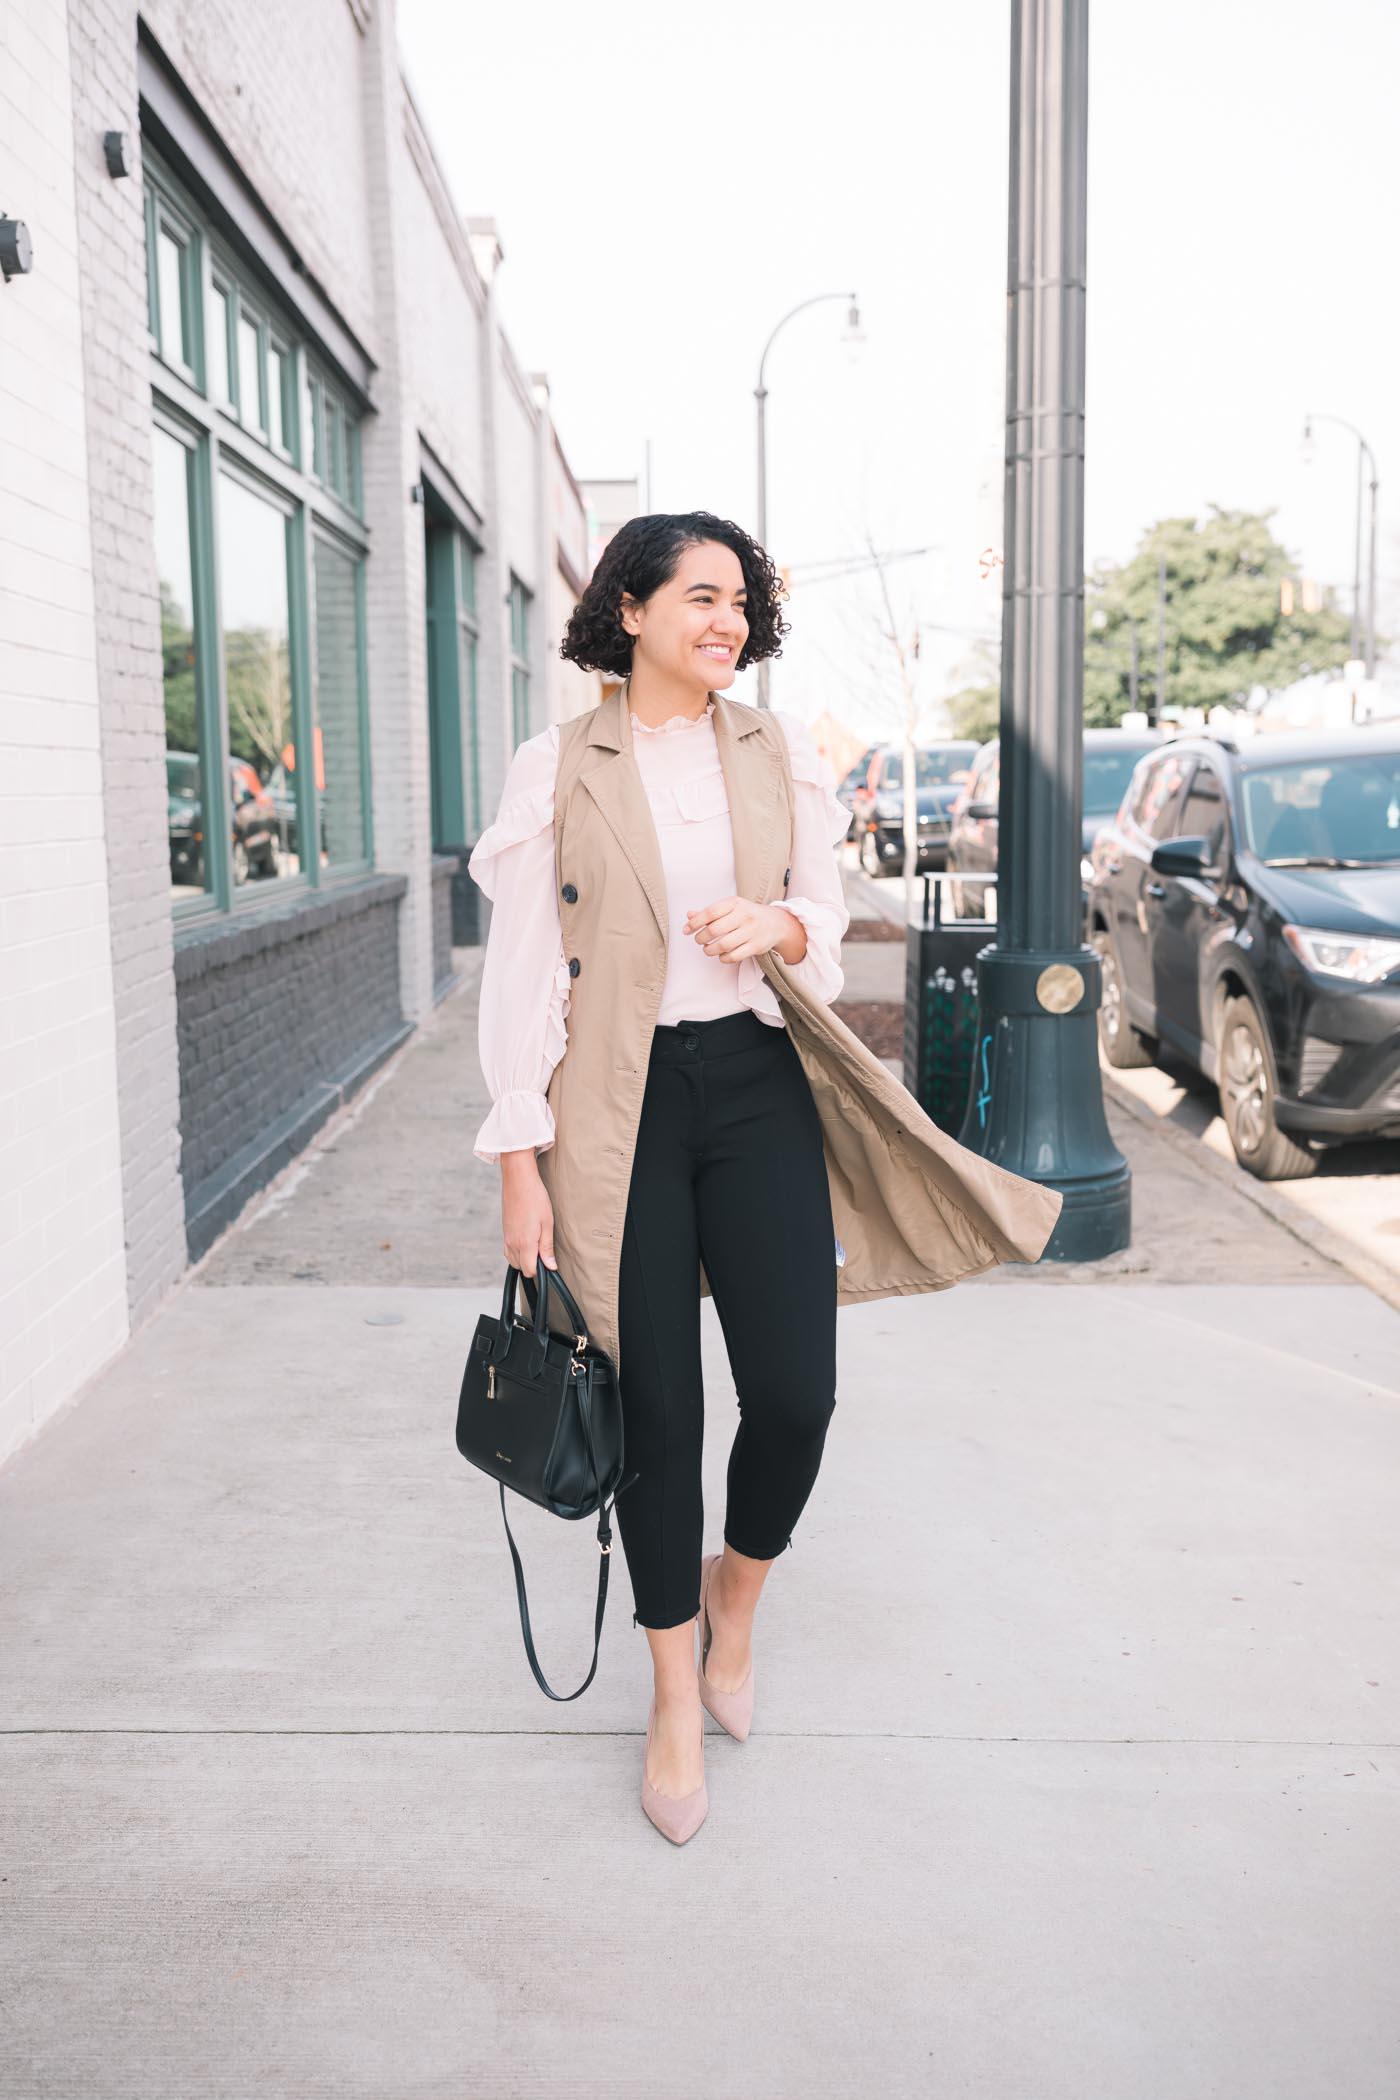 Pink Ruffle Blouse, Trench Vest, Black Dress Pants, Beige Heels, Black Bag